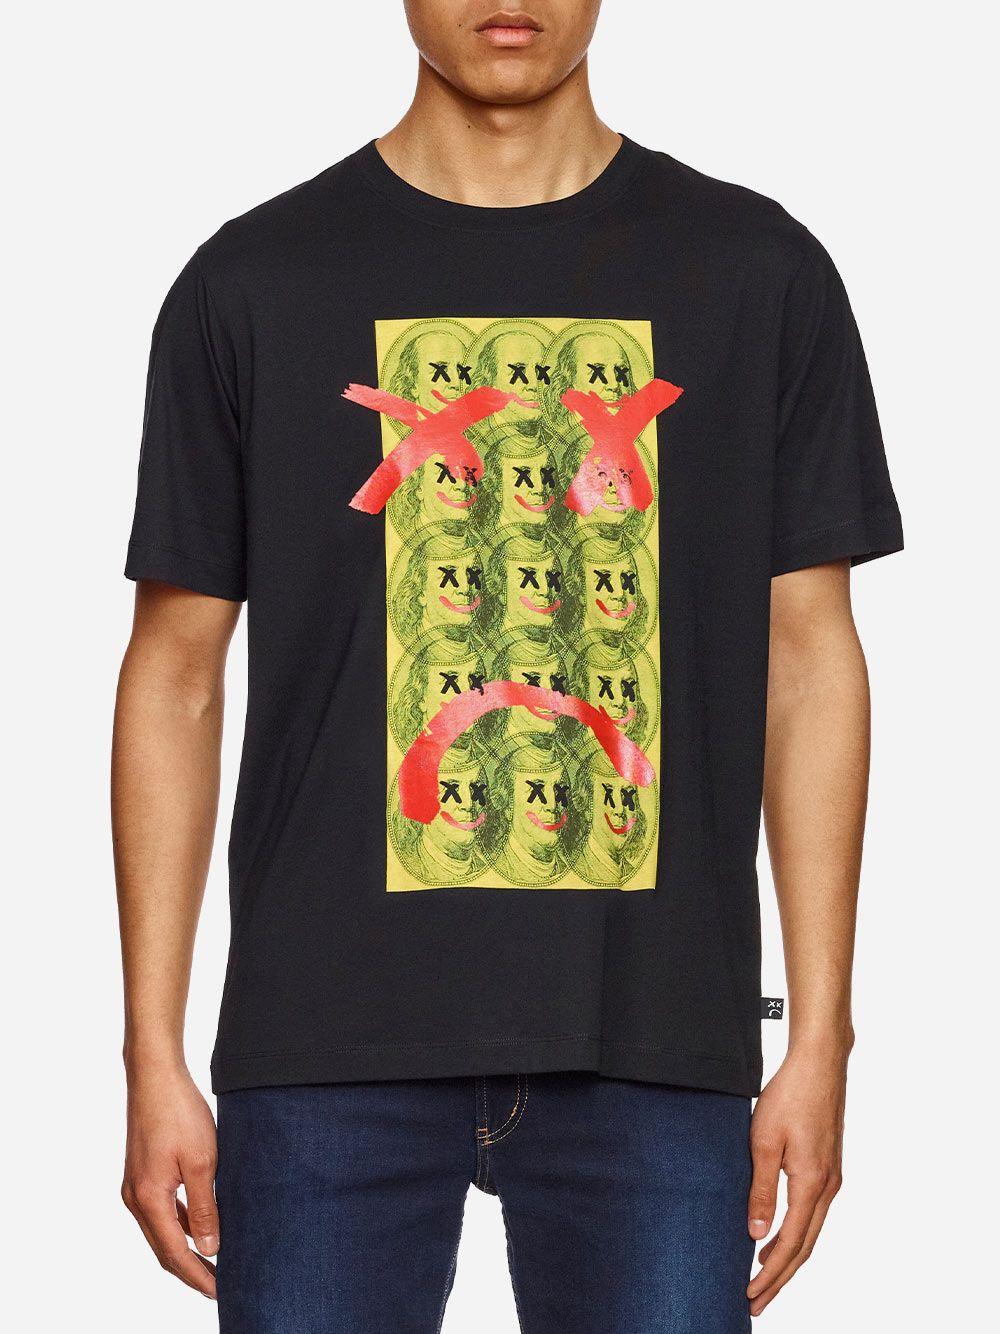 Tshirt Preta Estampada | AMBITIOUS